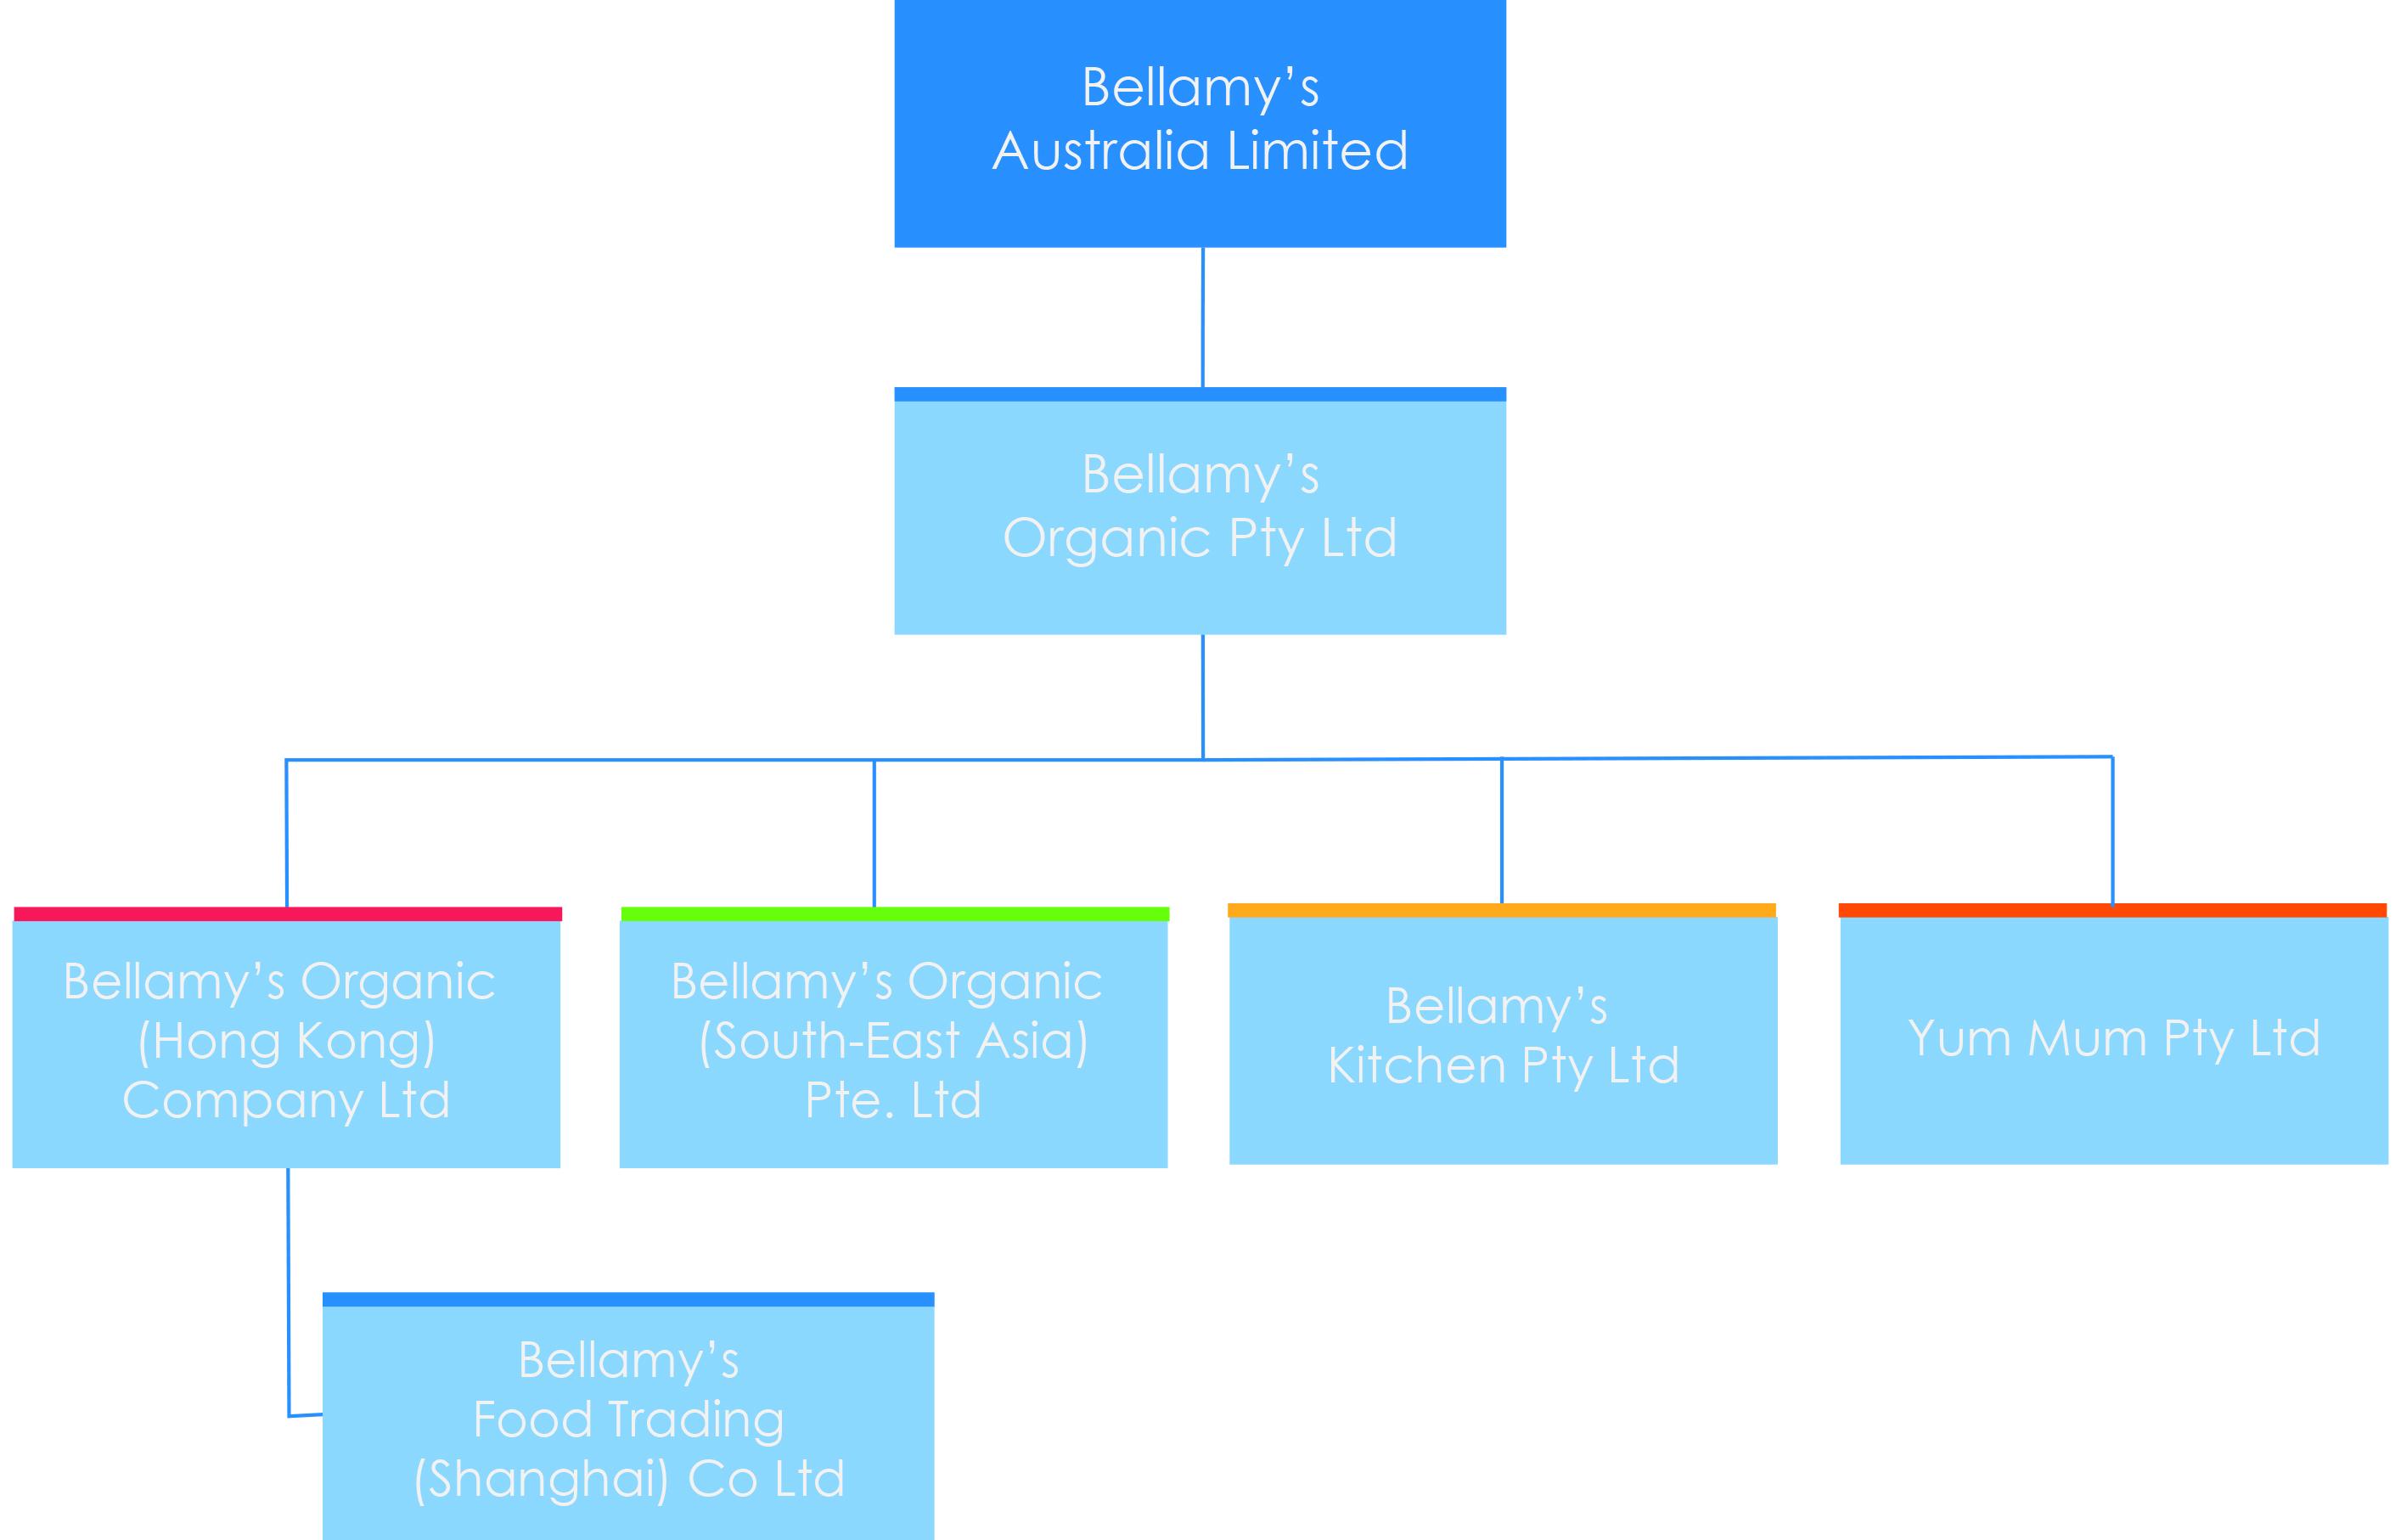 Kitchen Organizational Chart And Their Responsibilities: Bellamys australia company structure.jpg - Wikimedia Commons,Chart